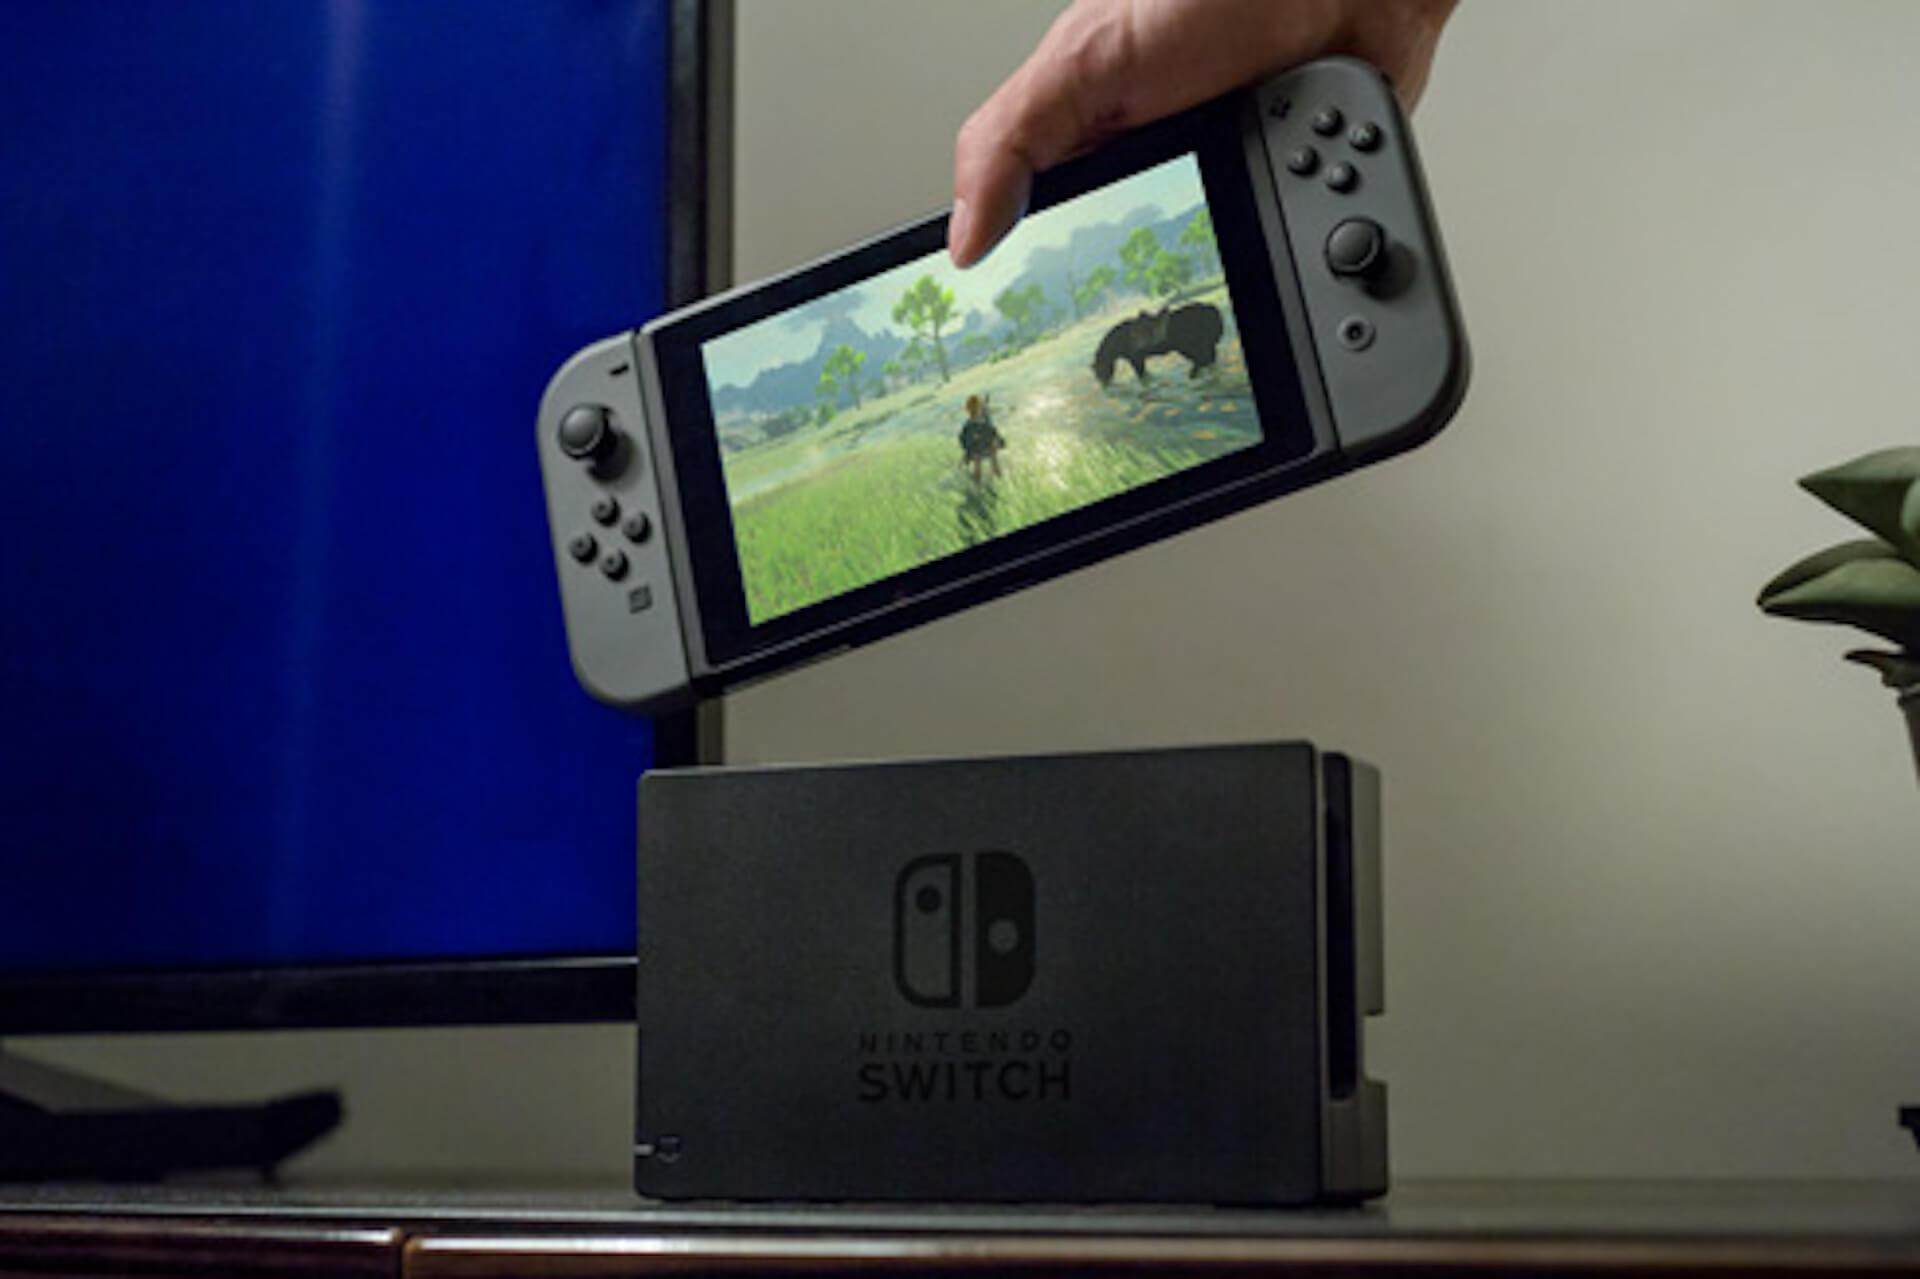 Nintendo Switch供給回復の兆し?海外通販サイトで定価での販売が増加か tech200508_nintendoswitch_main